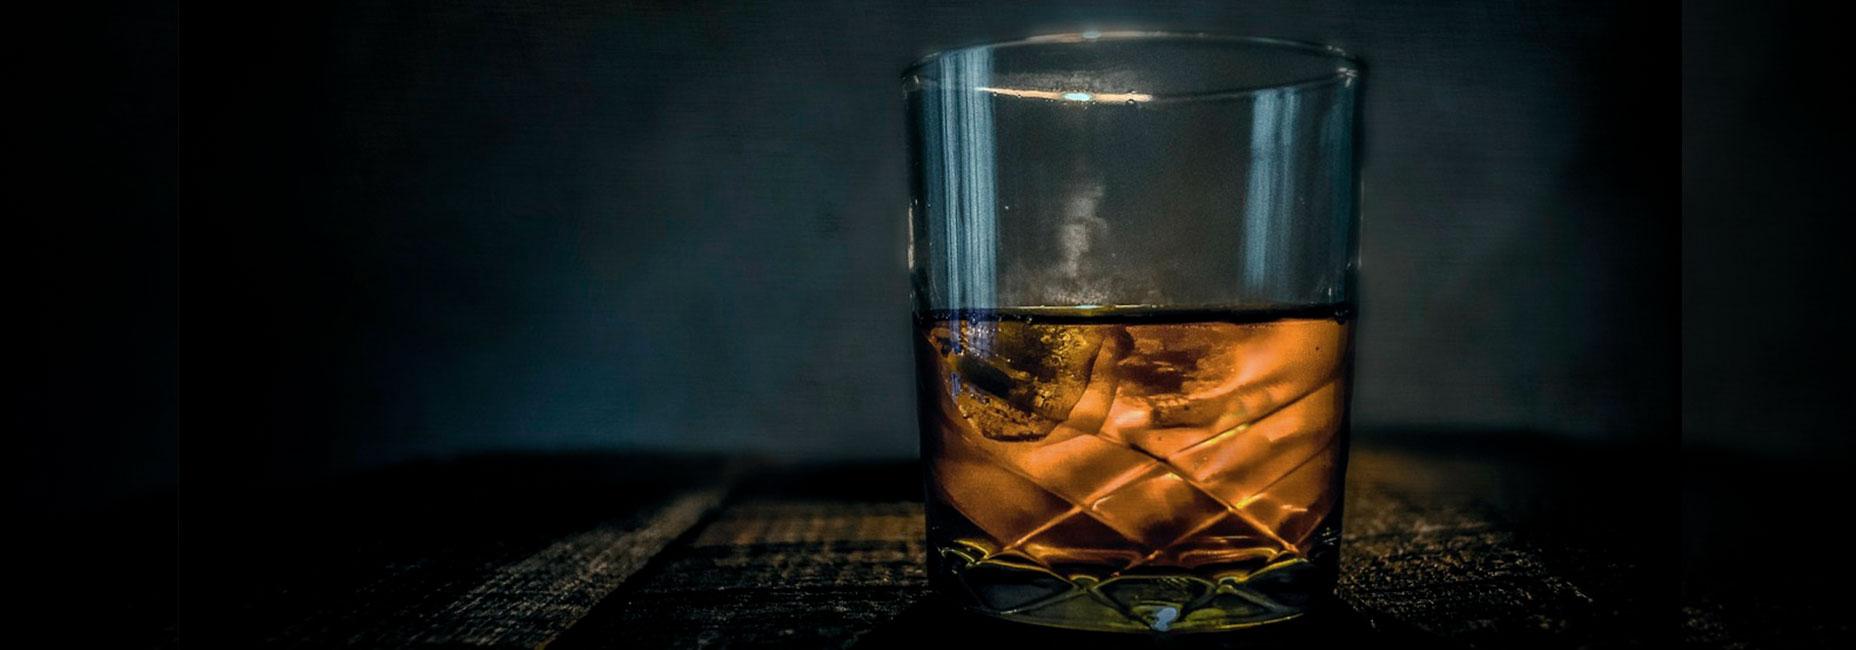 12 whiskies imprescindibles que todo papá debe tener